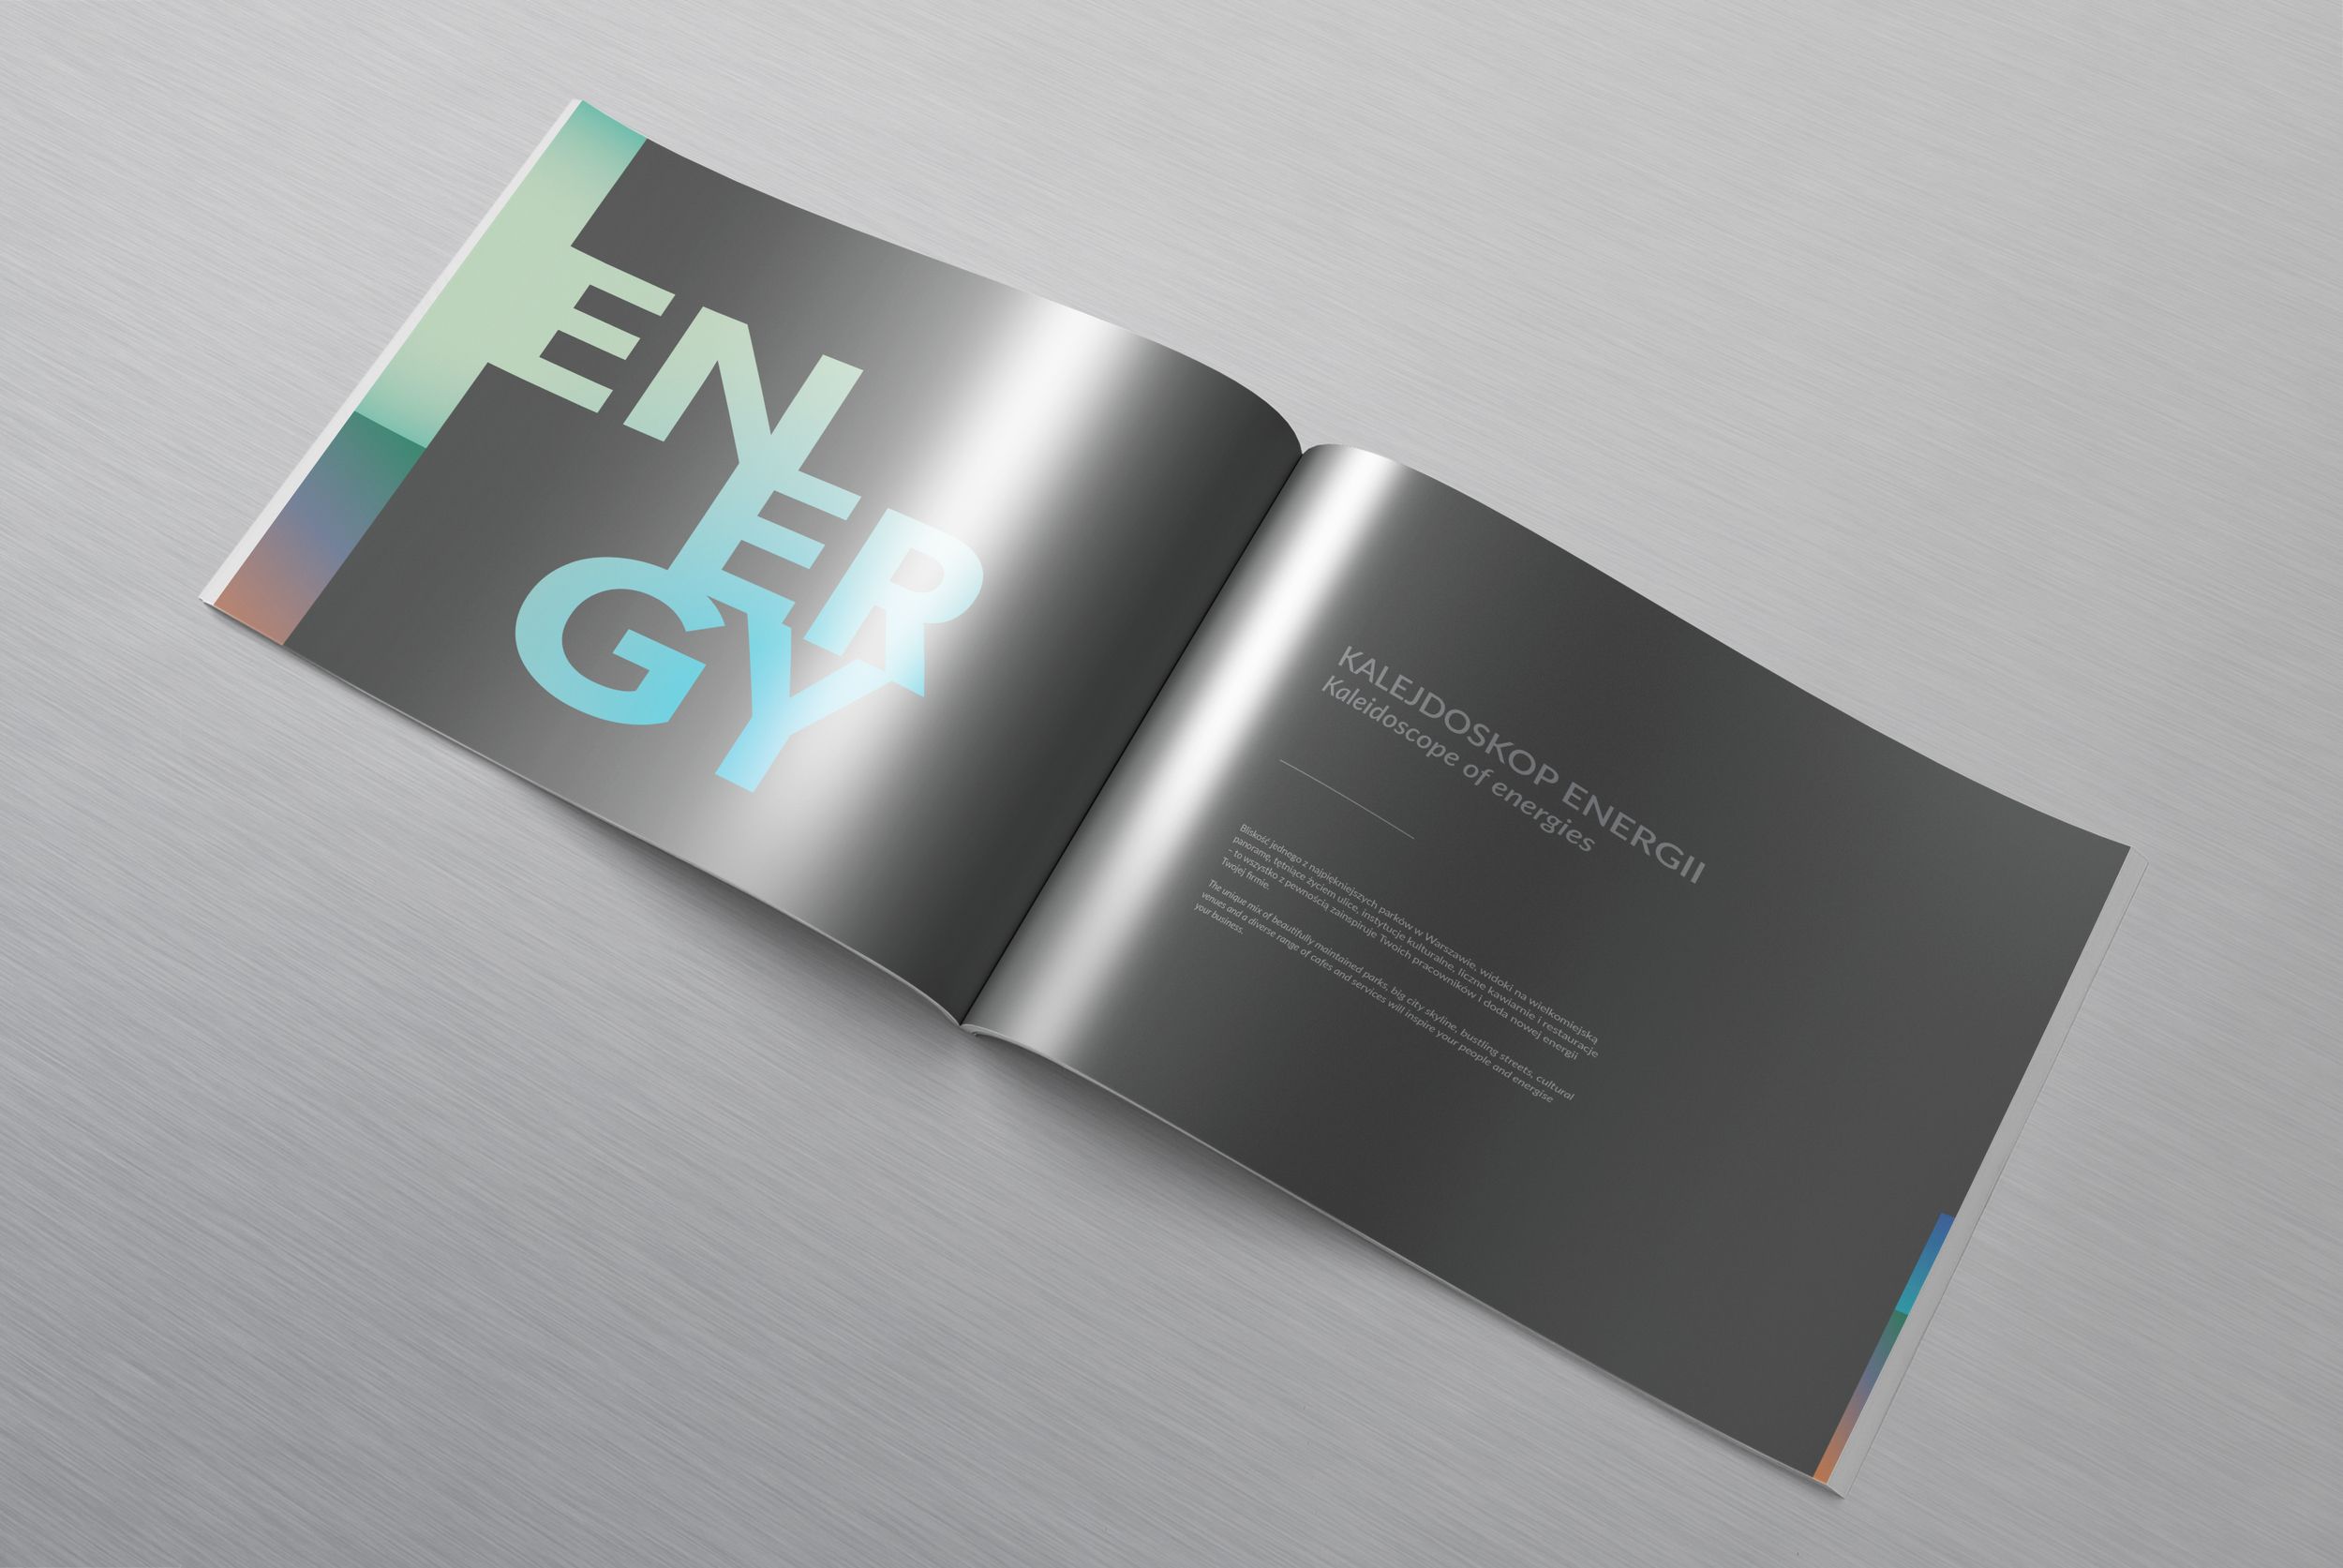 2015 Deka IBC brochure 4.jpg